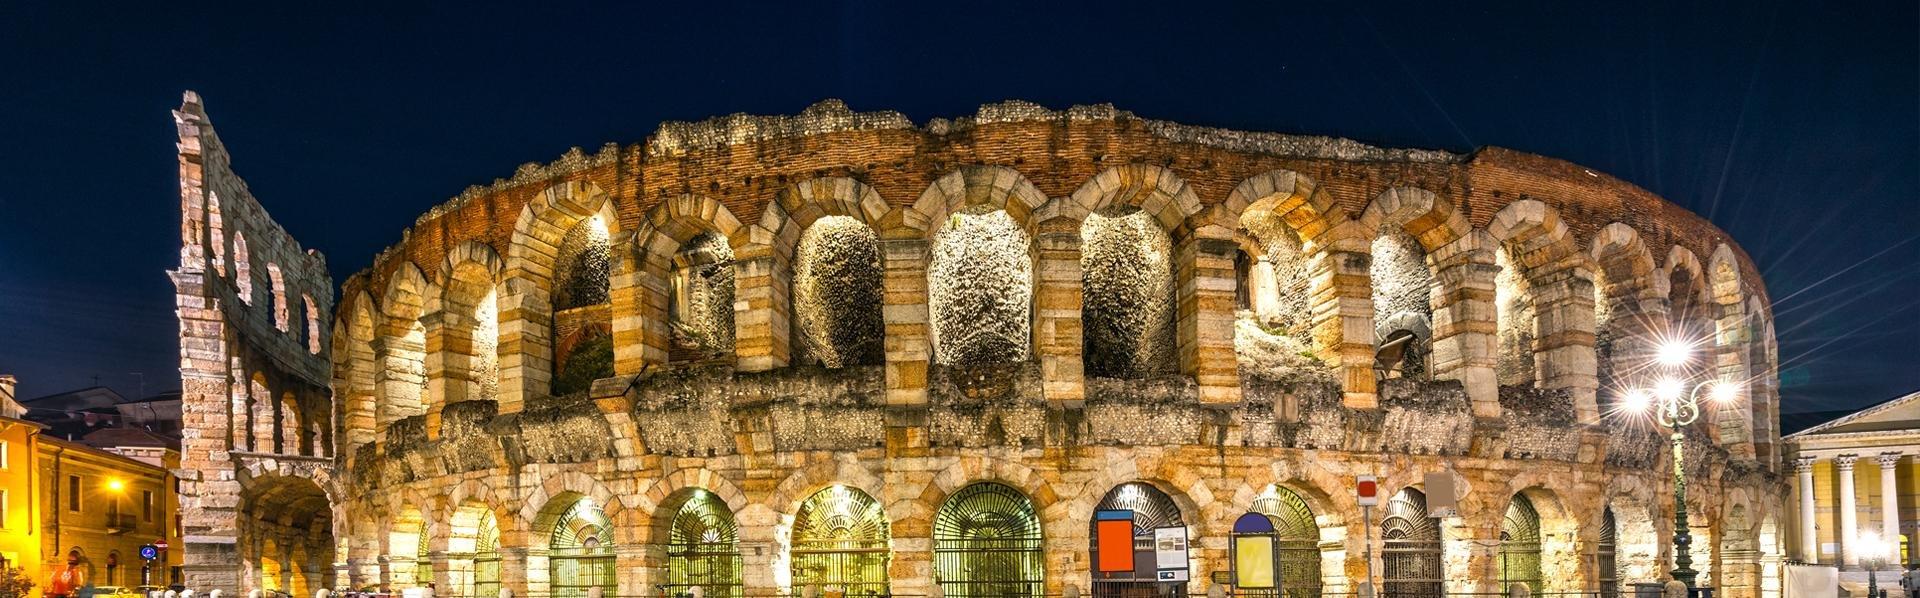 Arena di Verona, Italië